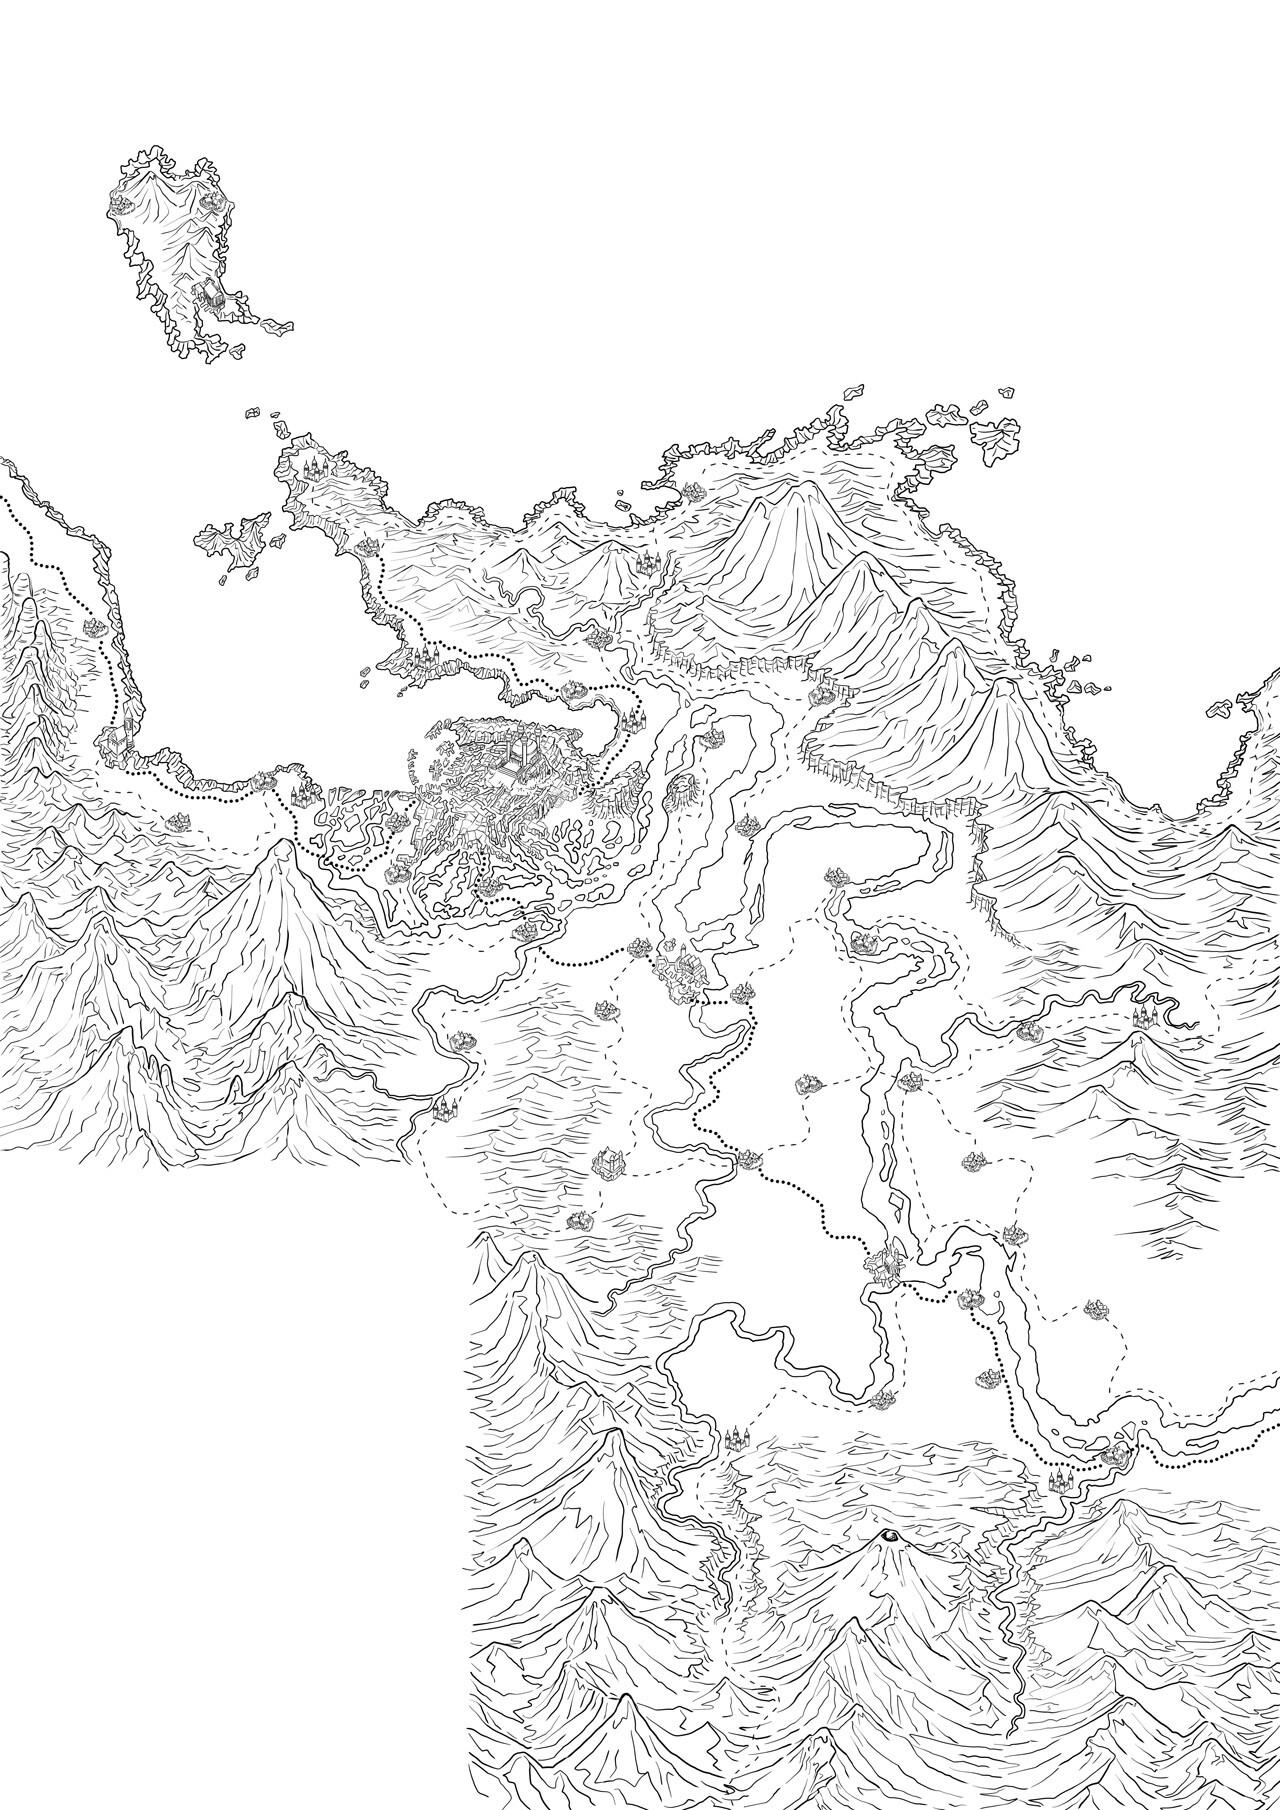 Axelle bouet carte region armanth9